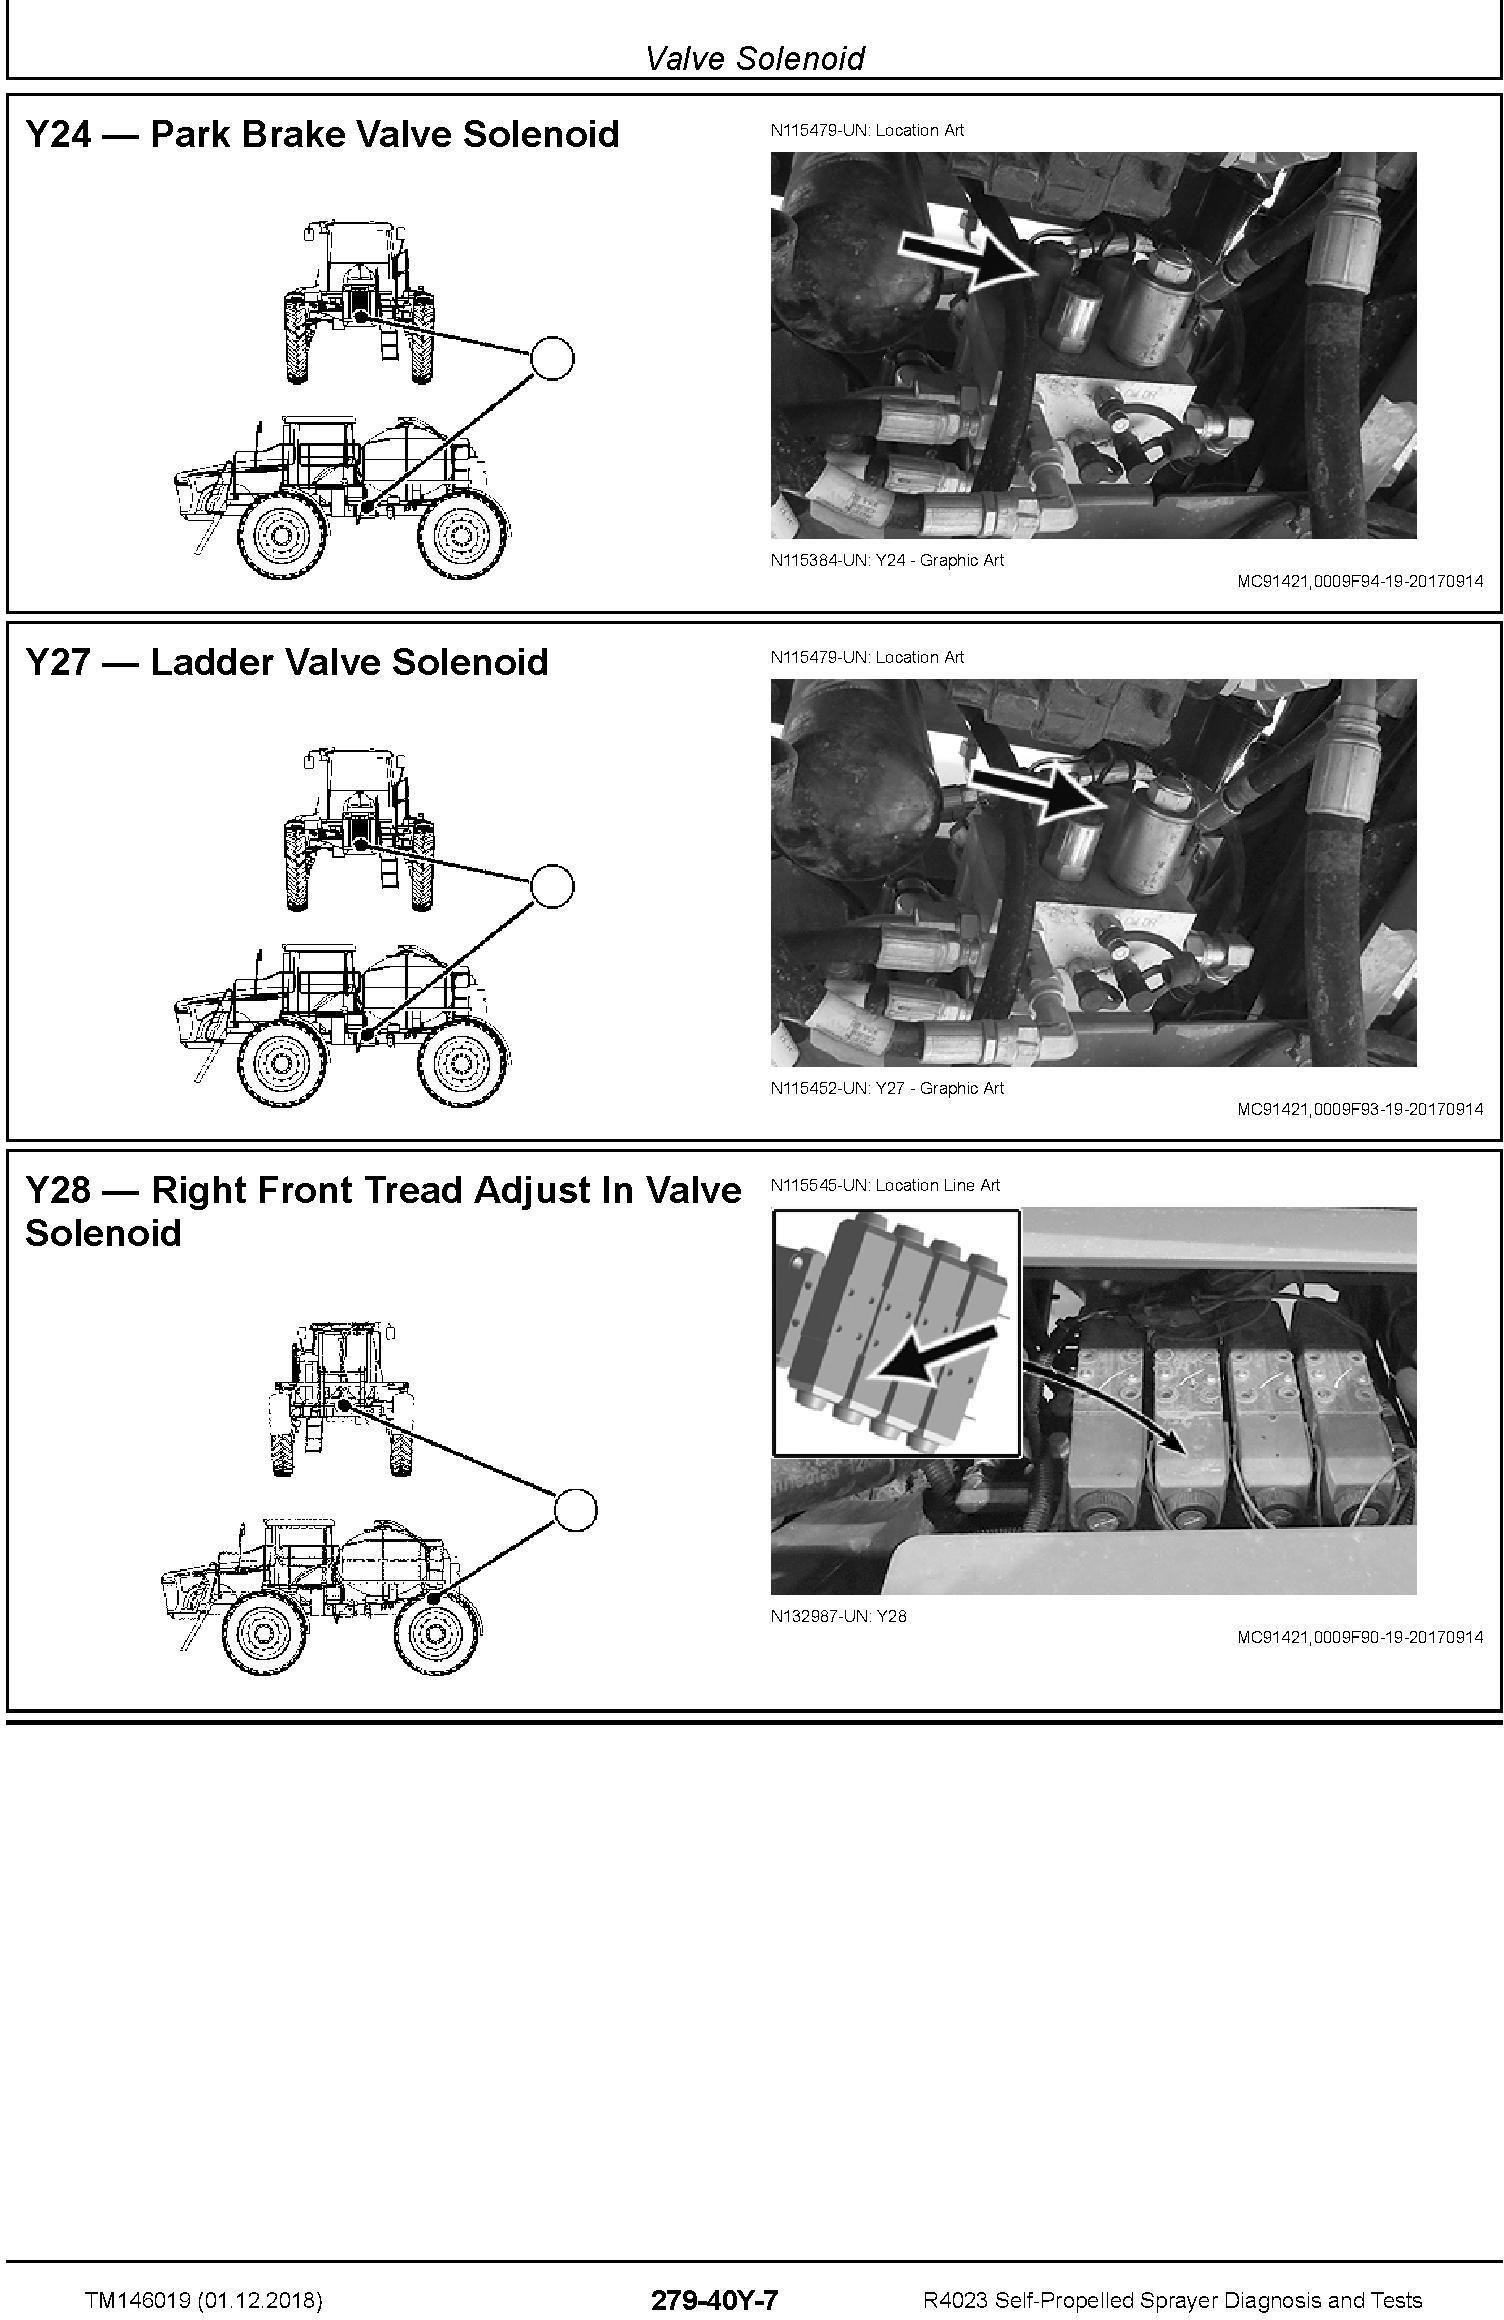 John Deere R4023 Self-Propelled Sprayer (SN. 180001-) Diagnostic Technical Manual (TM146019) - 2